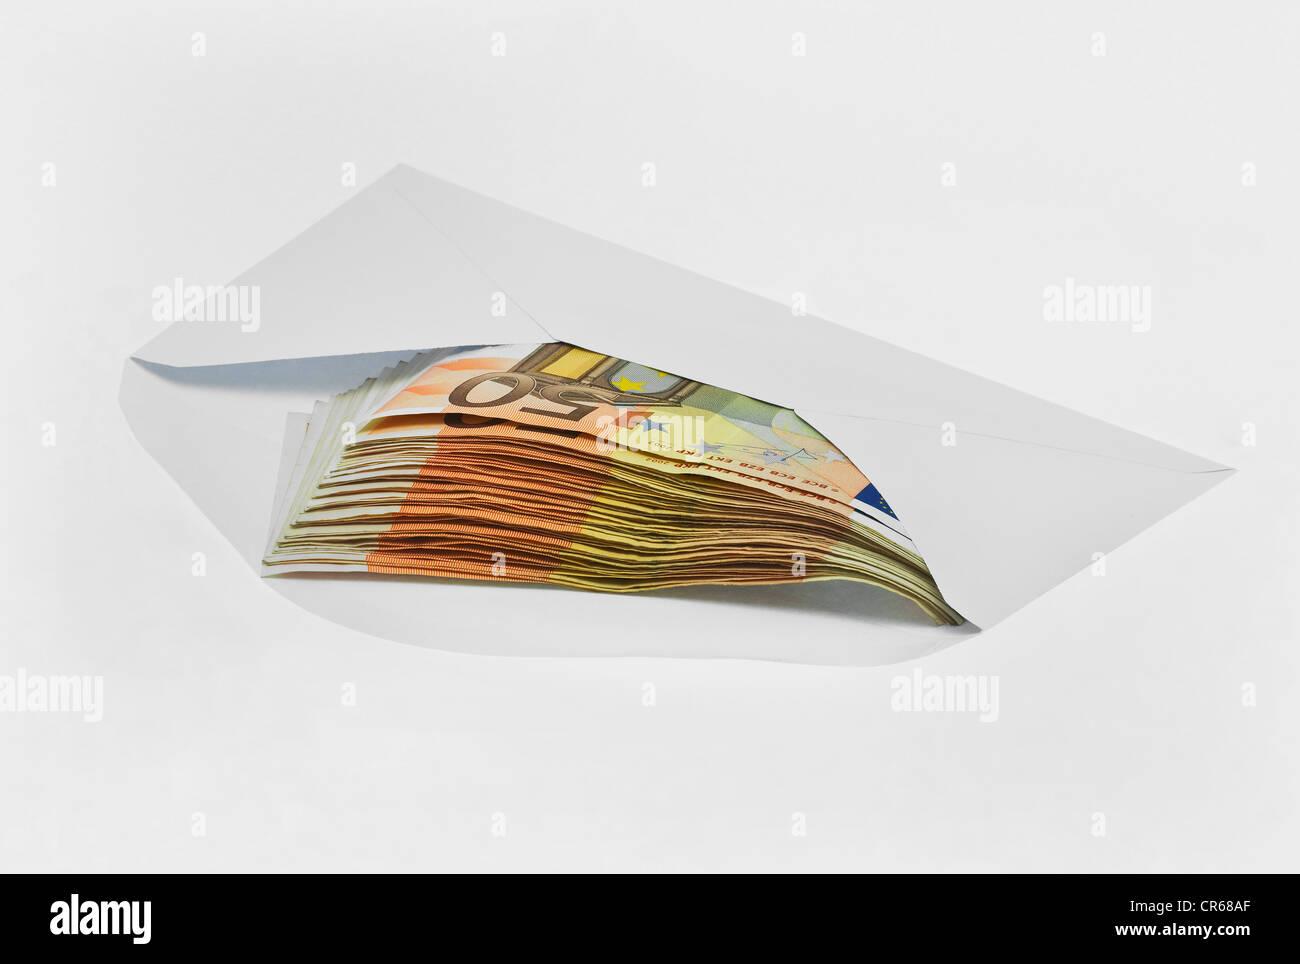 Envelope with 50-euro banknotes, bribe money, black money - Stock Image